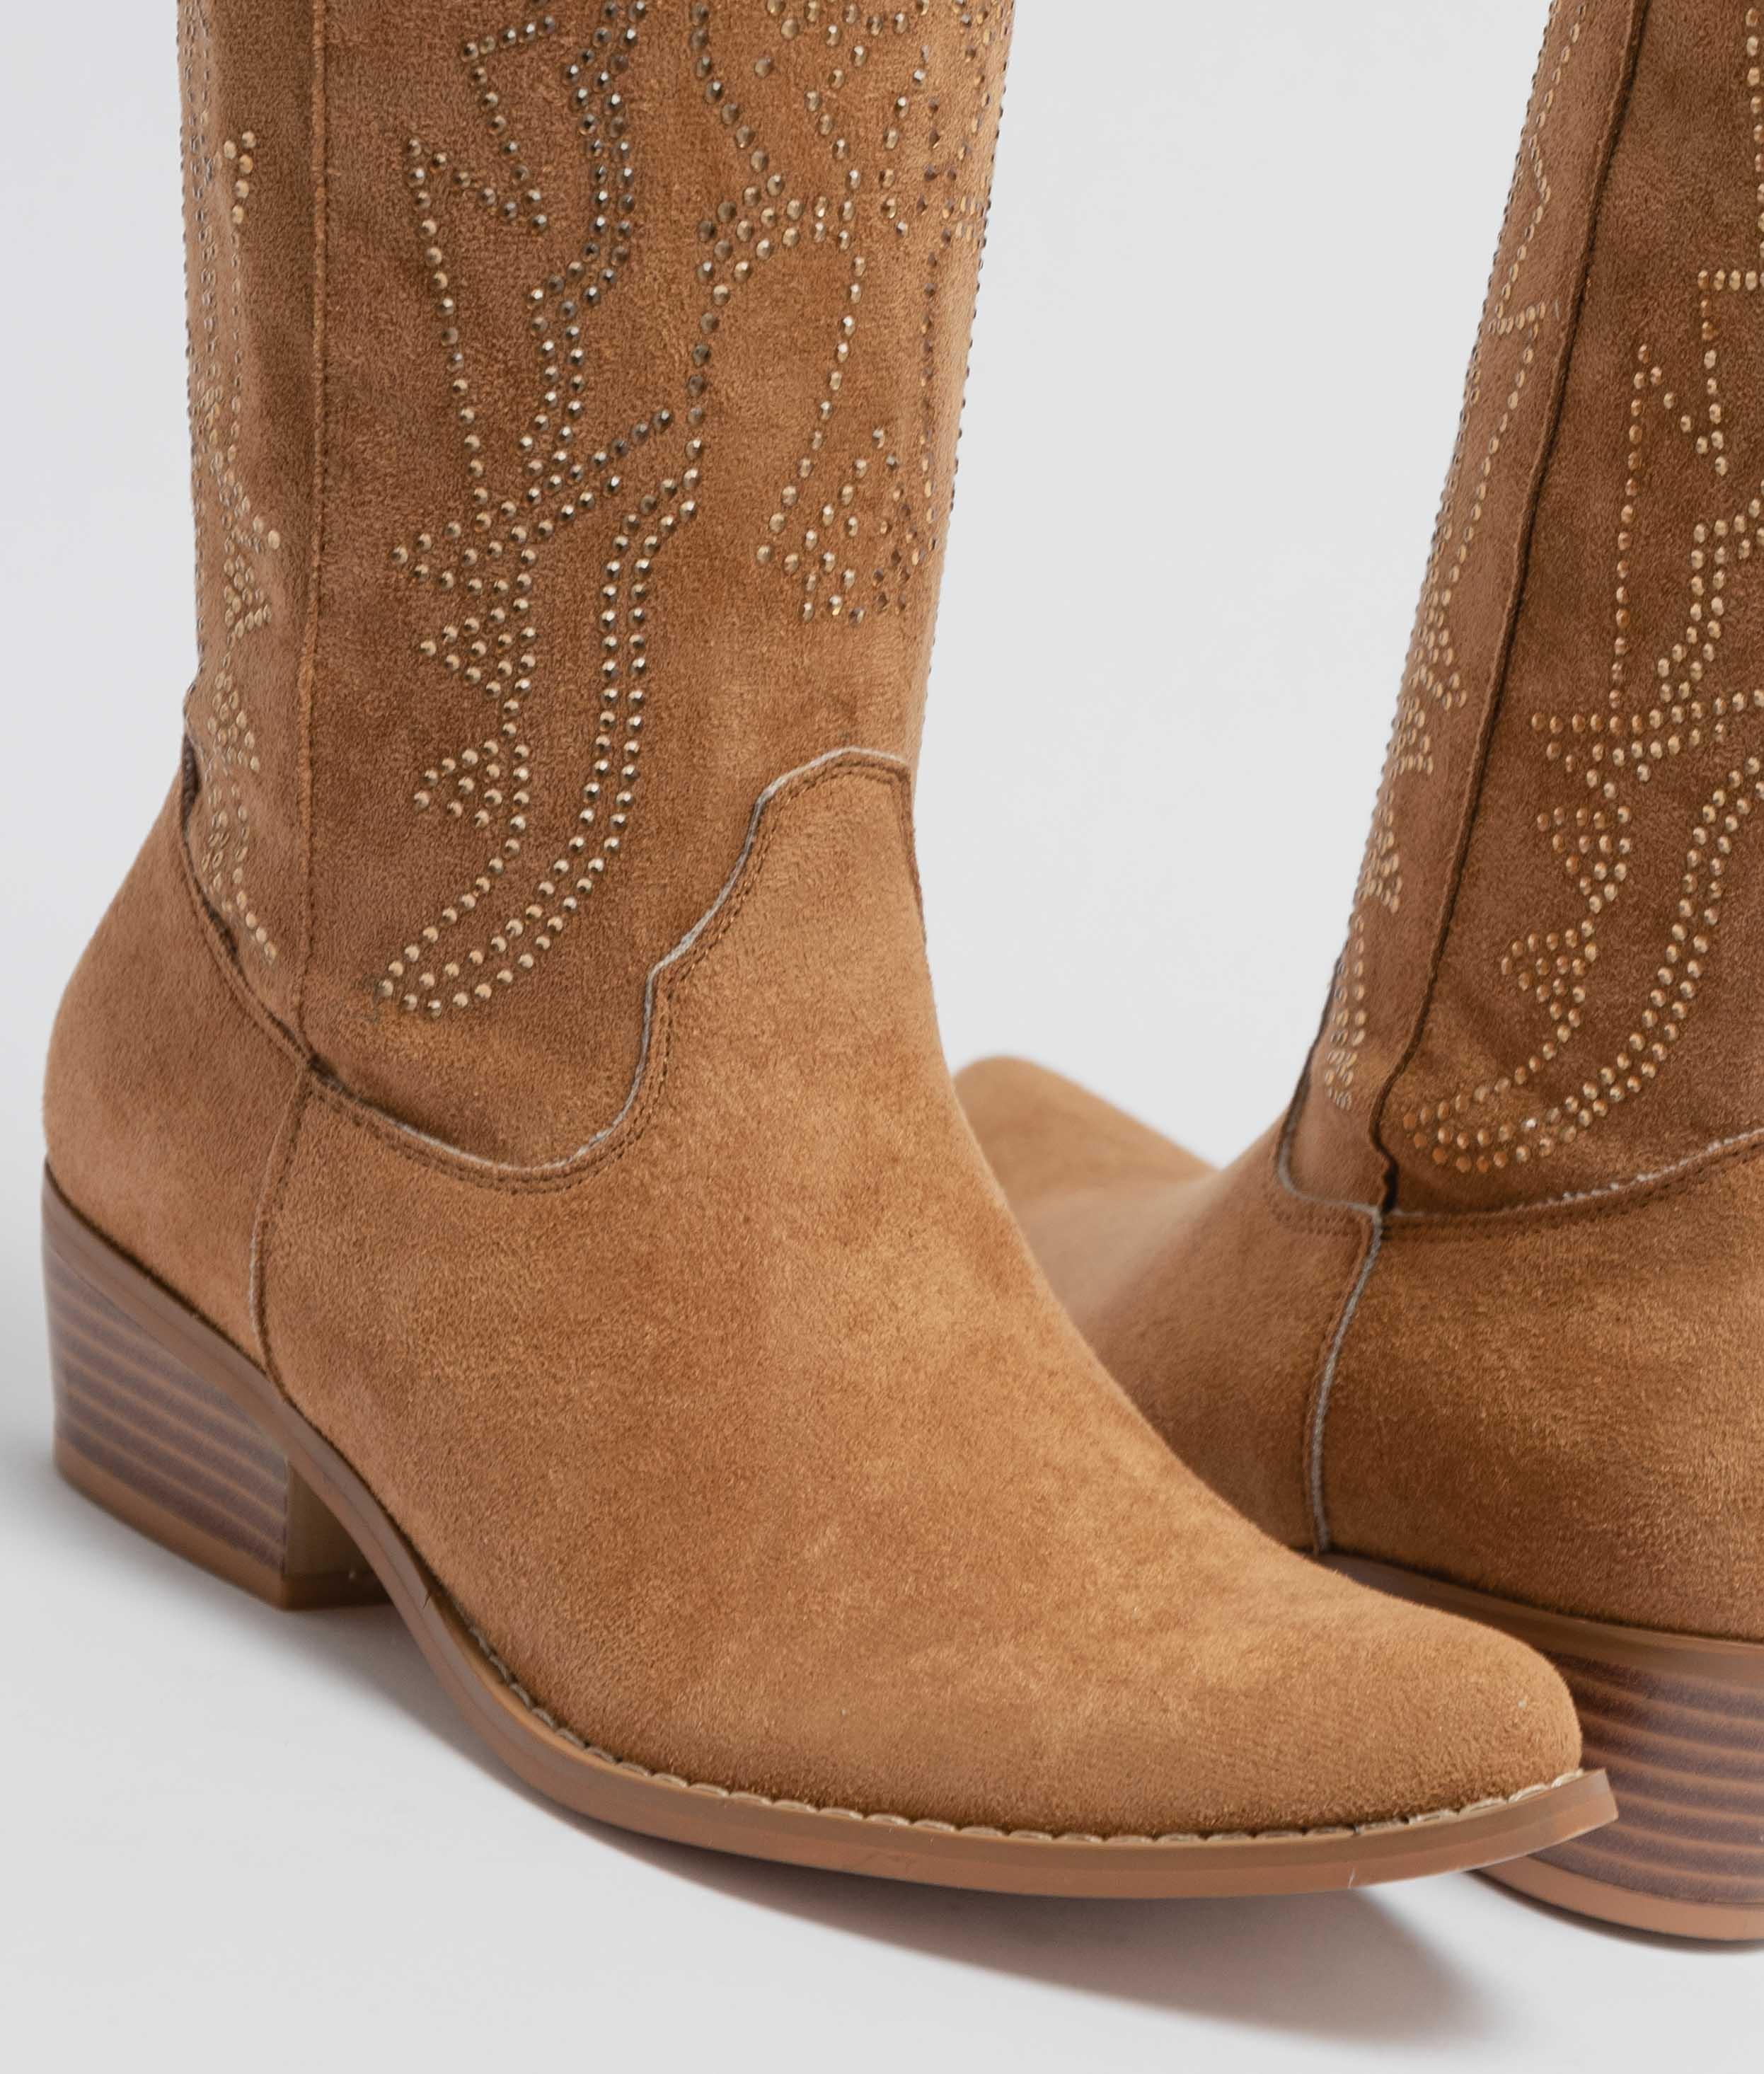 Cauva Low Boot - Camel